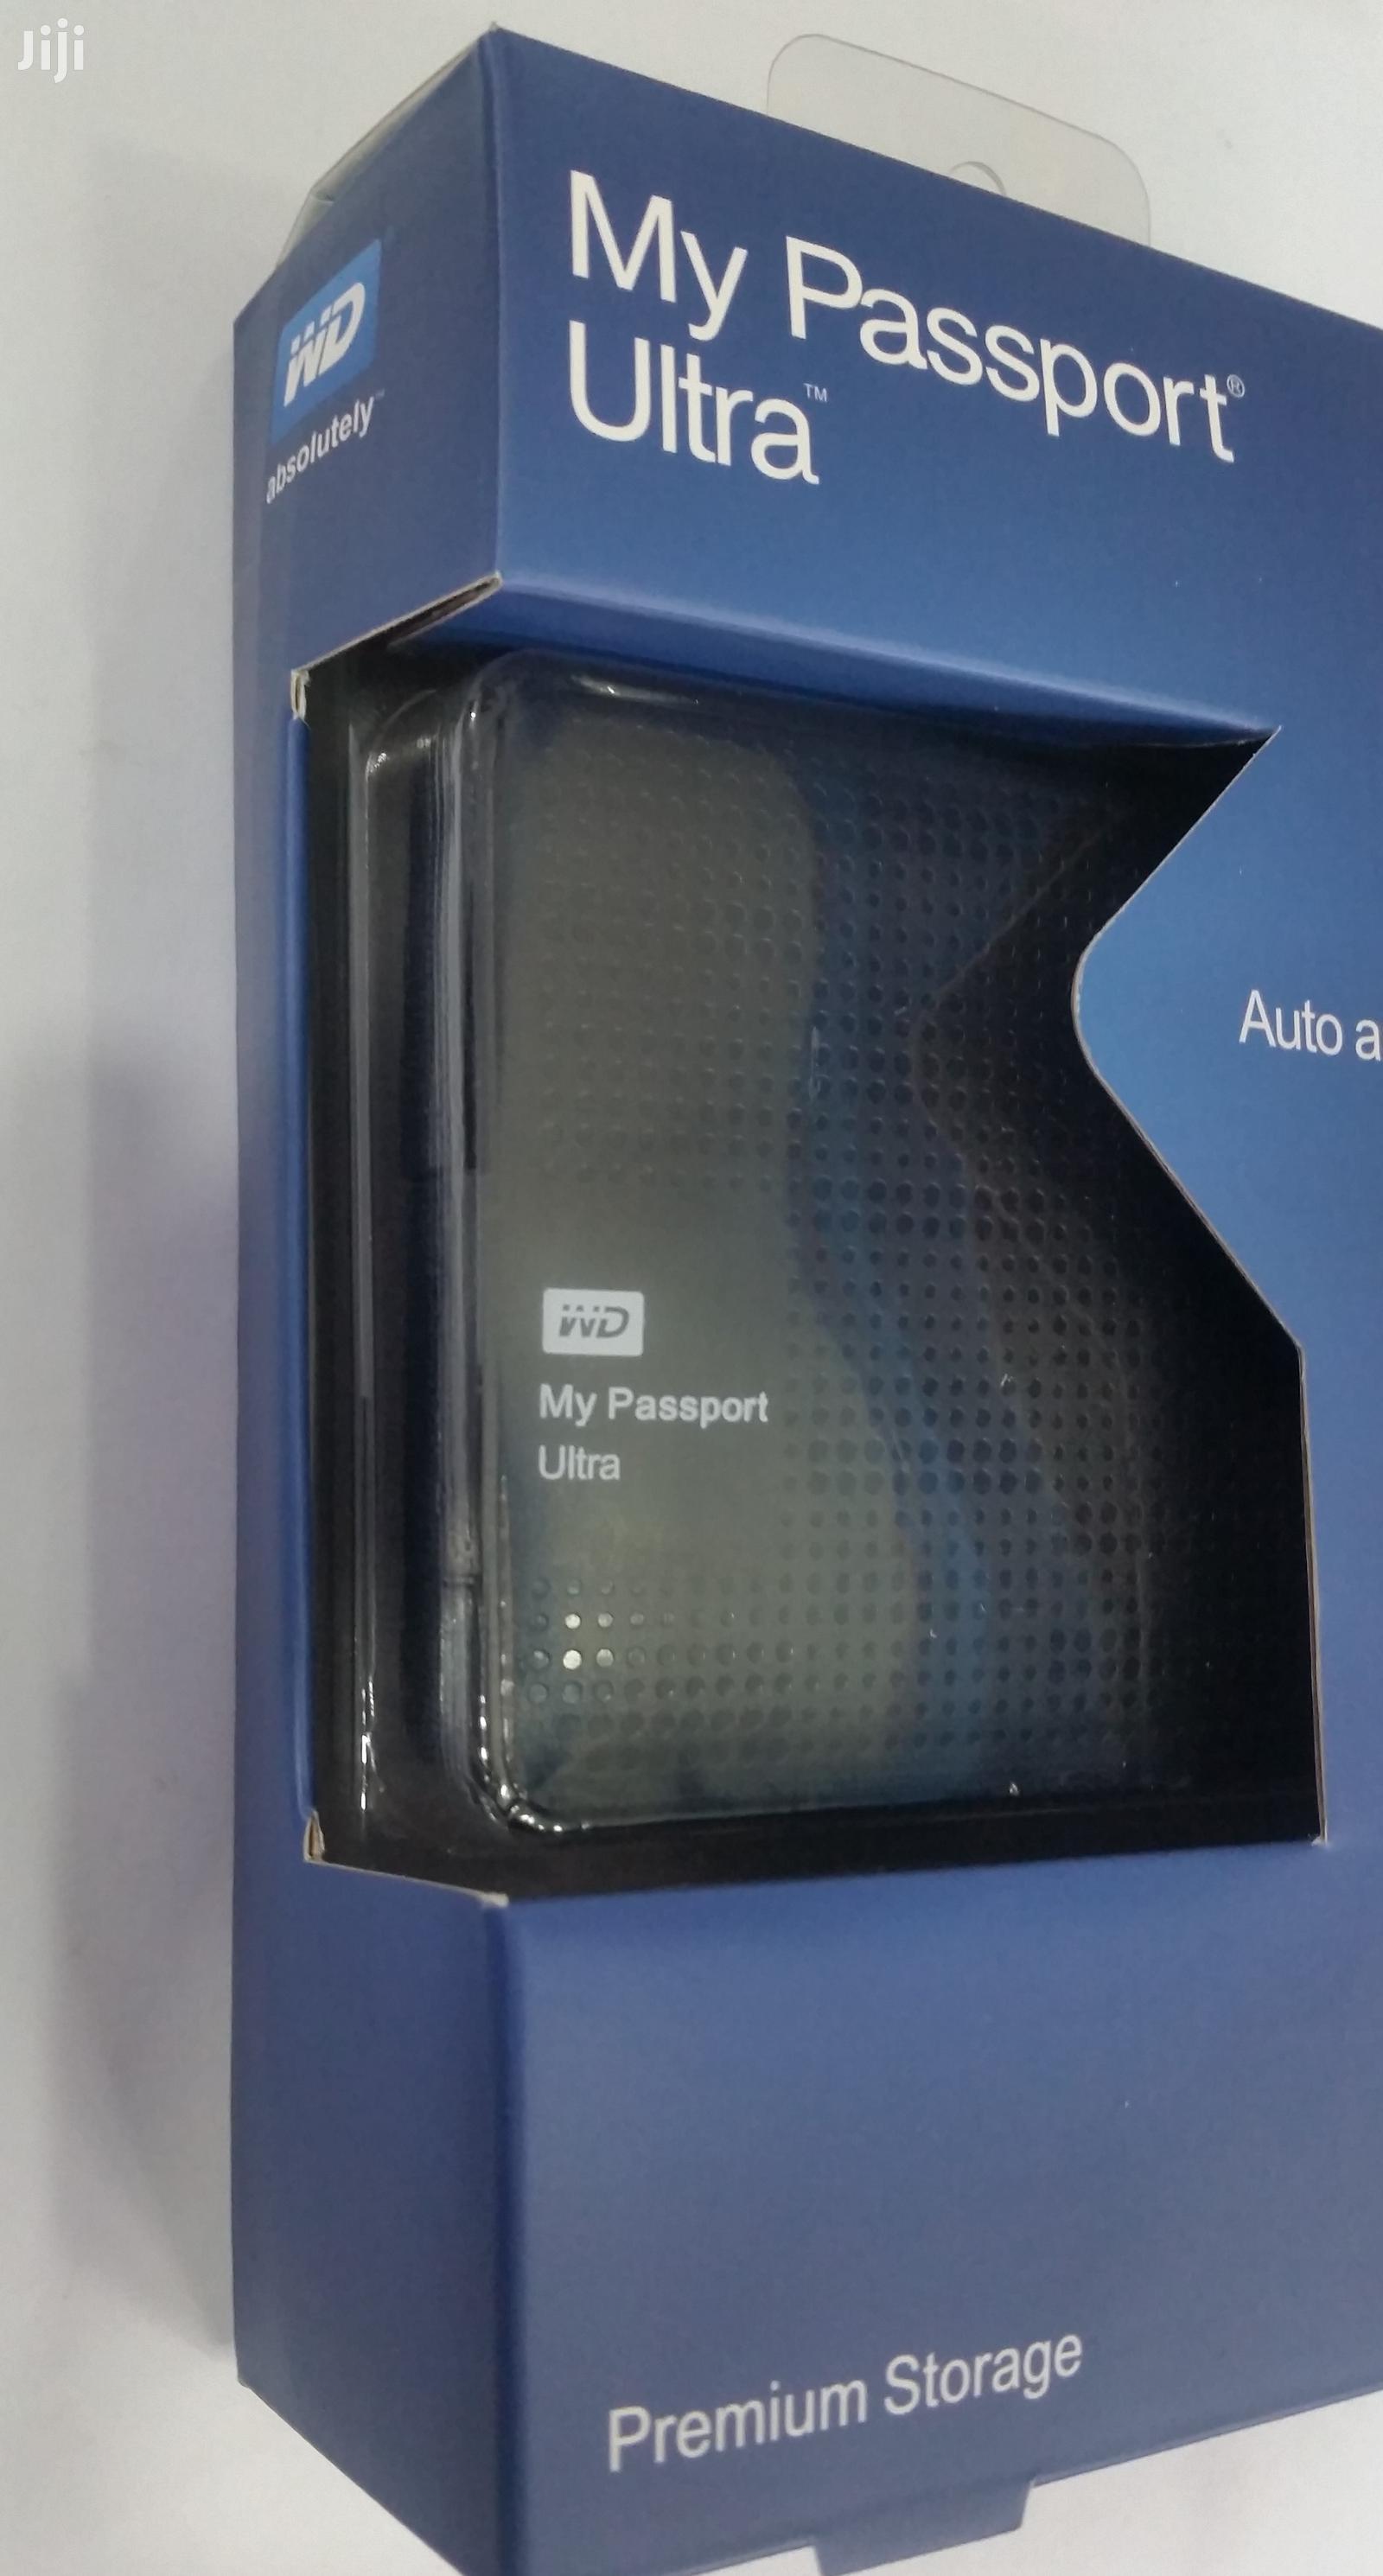 WD 3.0 My Passport Ultra External Hard Disk Case For Laptop | Computer Hardware for sale in Kampala, Central Region, Uganda